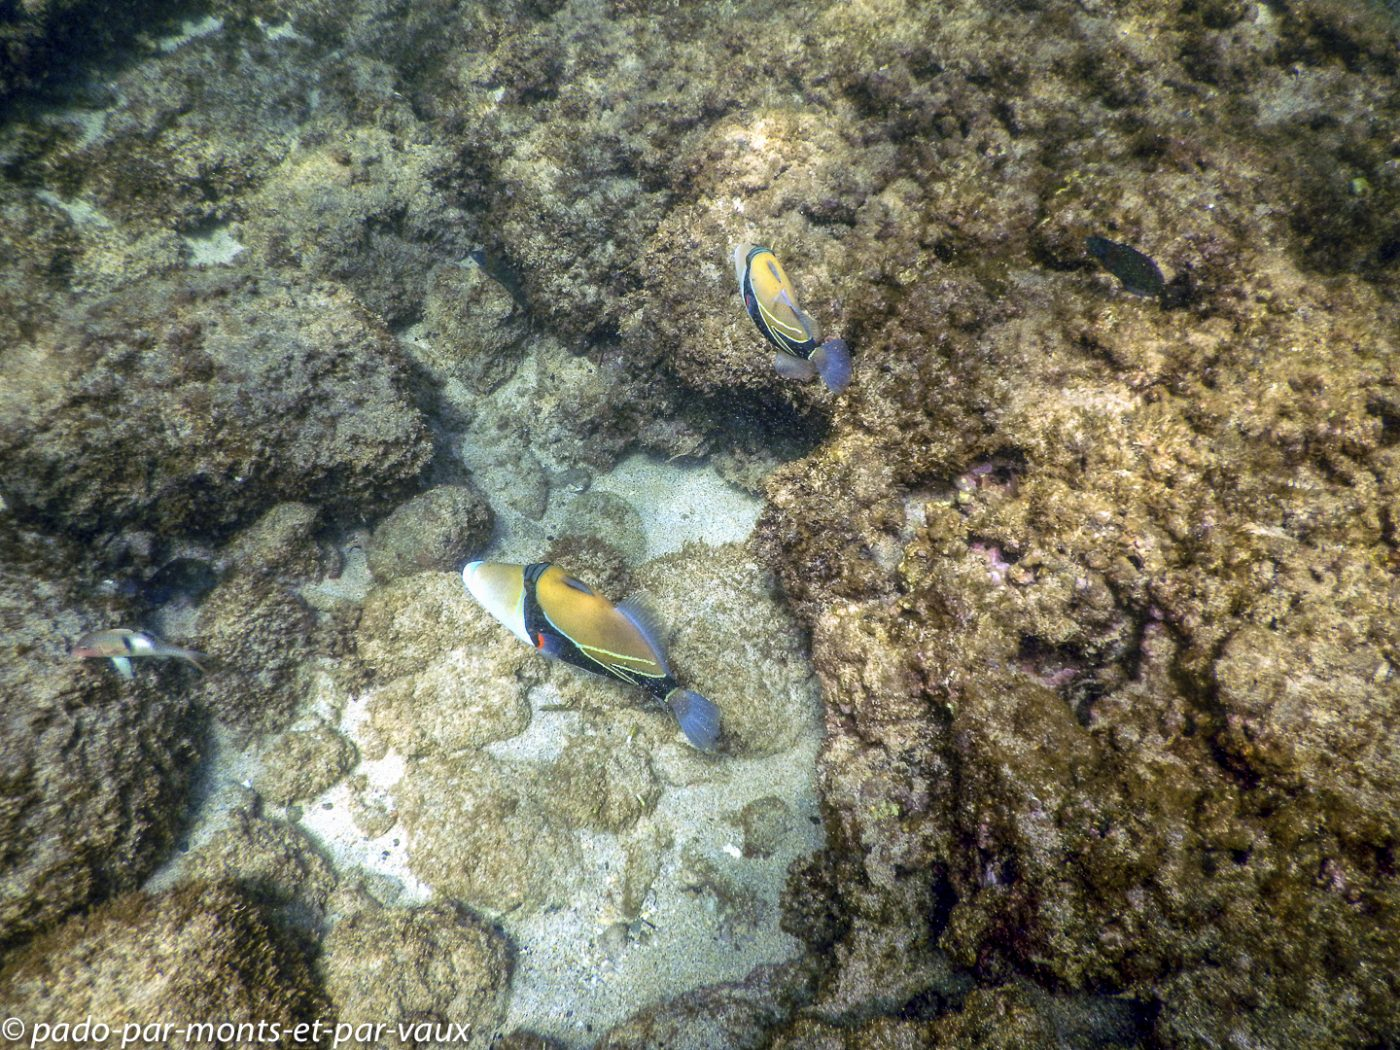 Maui - DT Fleming beach - Baliste écharpe